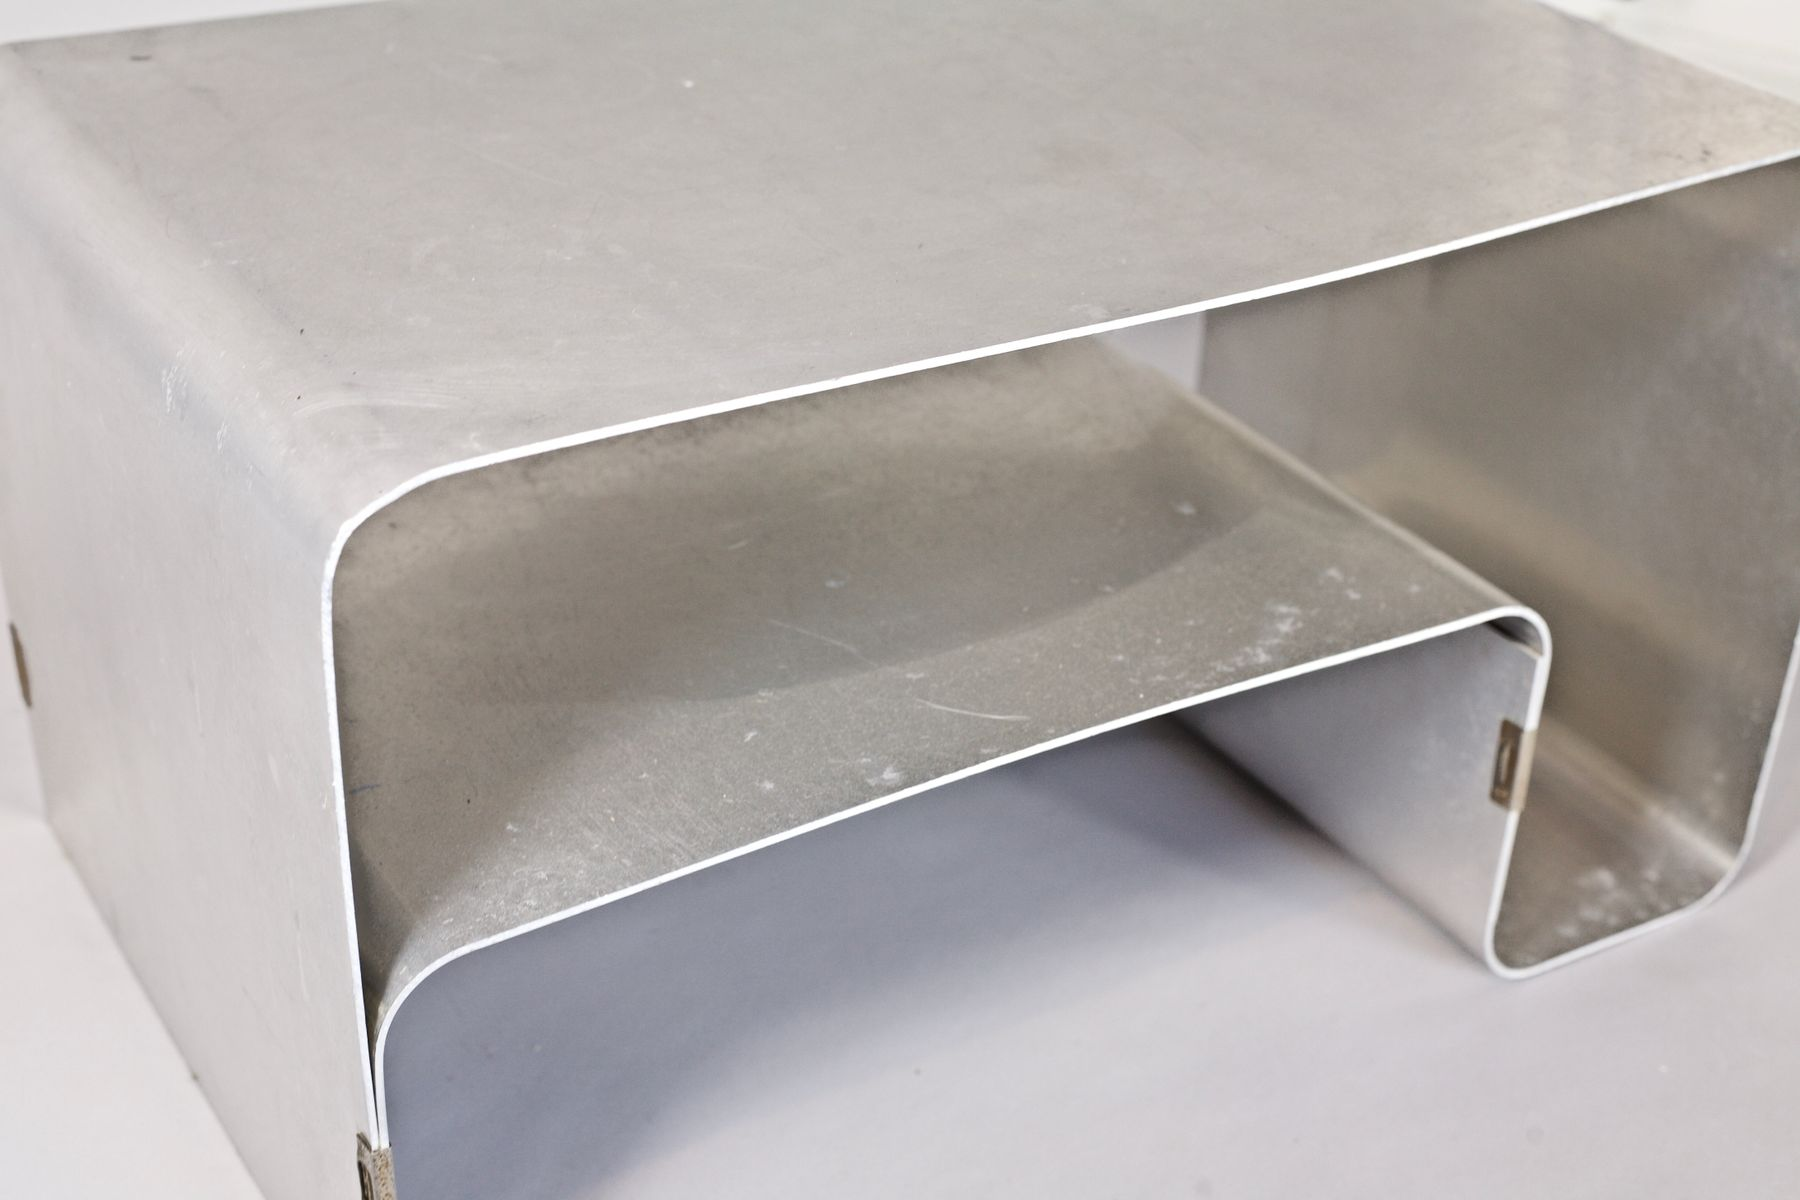 table basse en acier bross par joel ferlande pour kappa 1970s en vente sur pamono. Black Bedroom Furniture Sets. Home Design Ideas